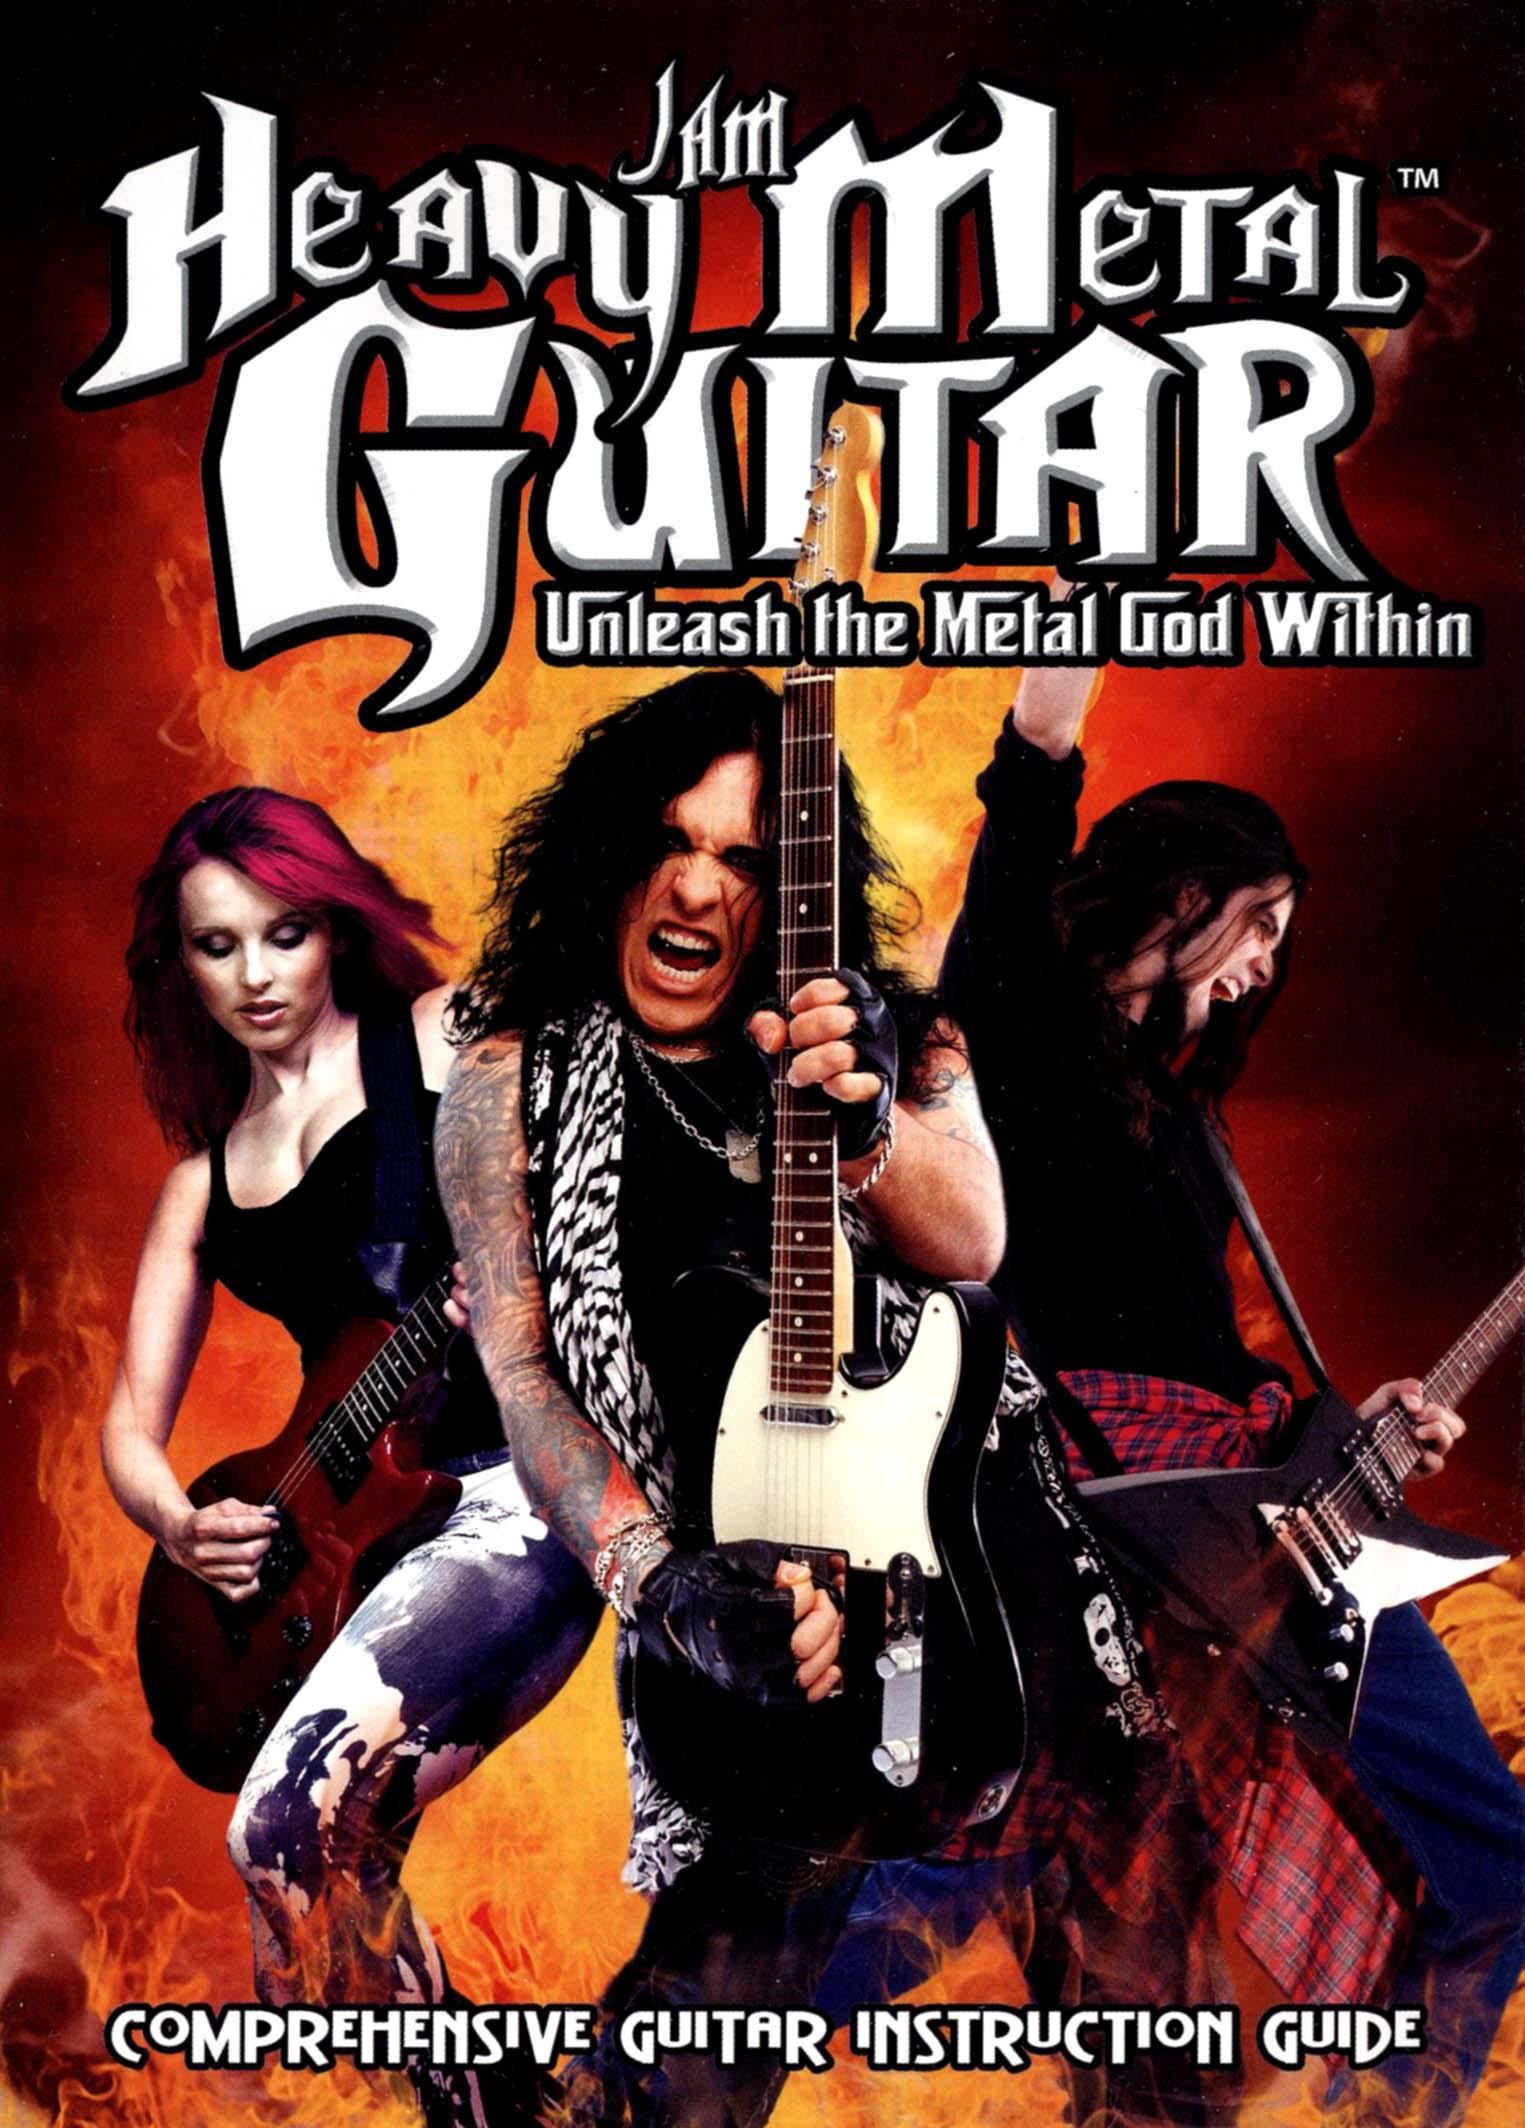 Jam Heavy Metal Guitar: Unleash the Metal God Within